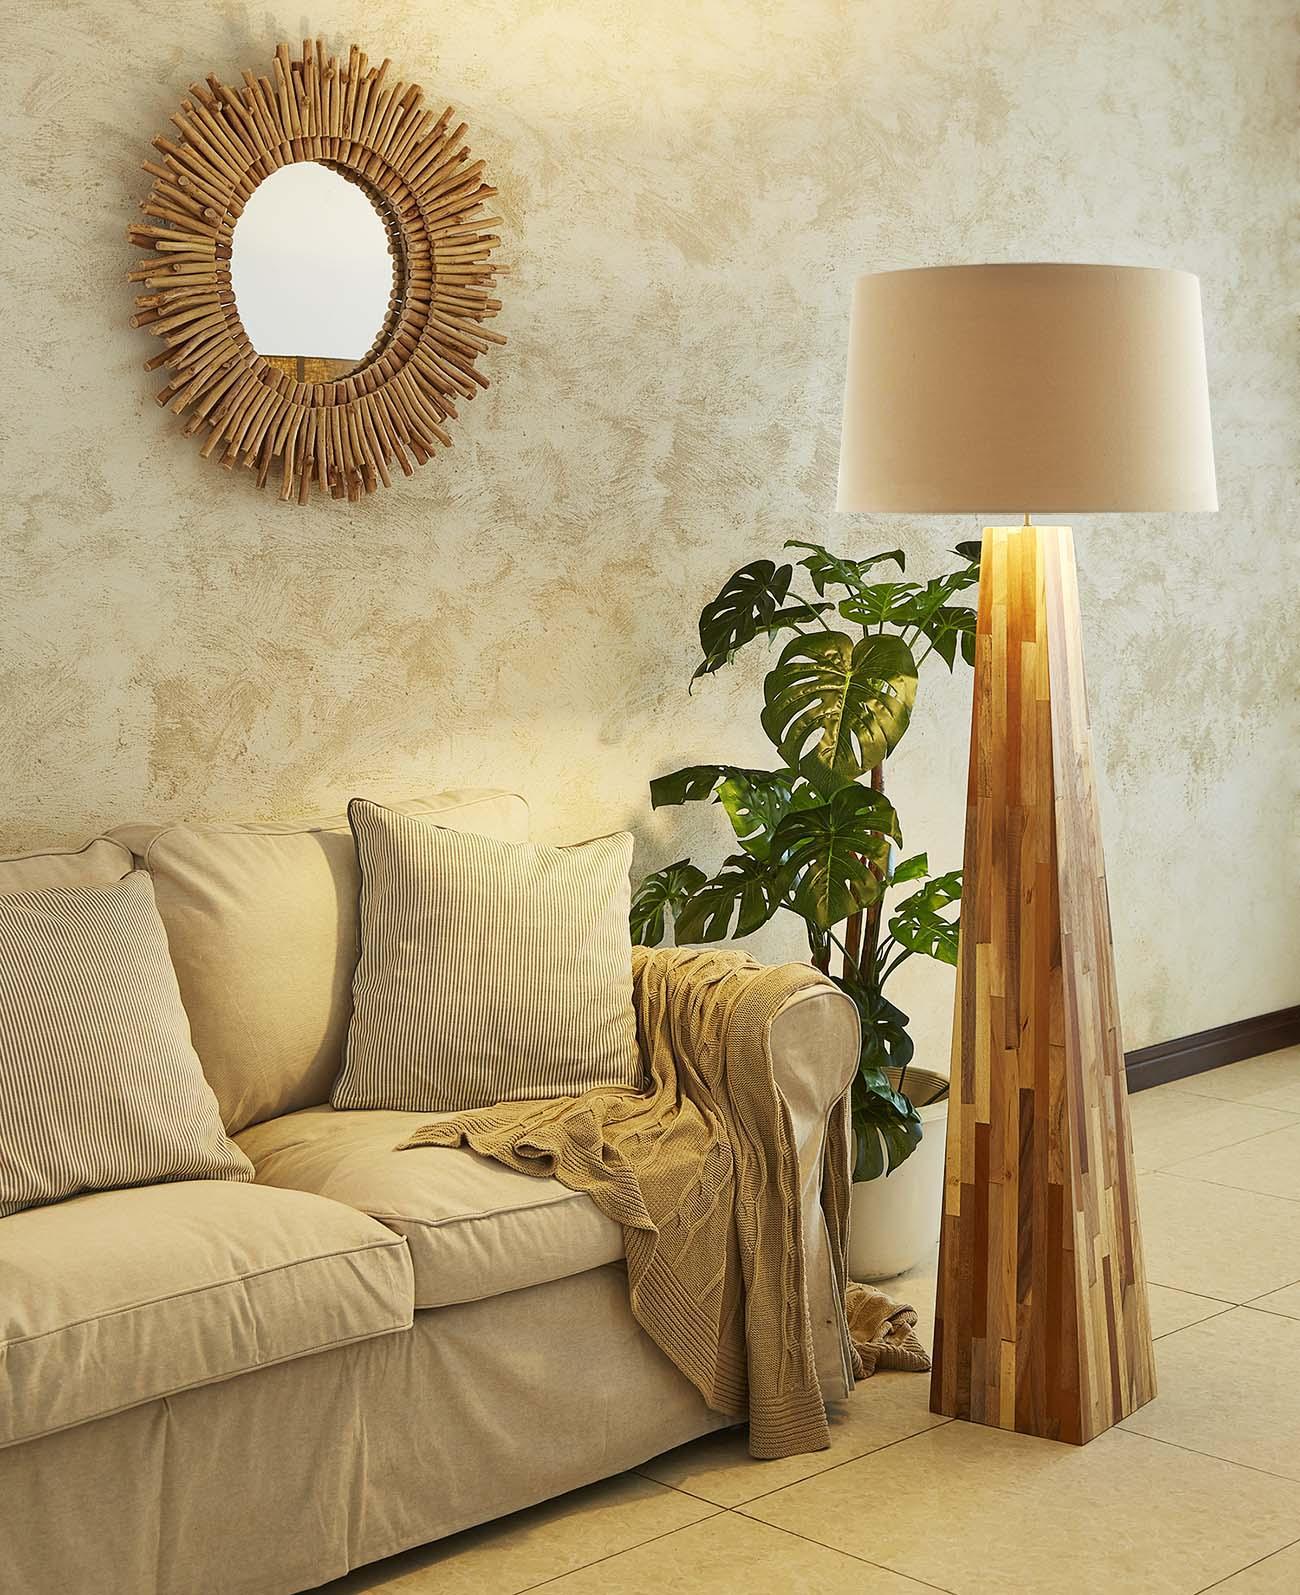 Line Teak Floor Lamp product photo #1